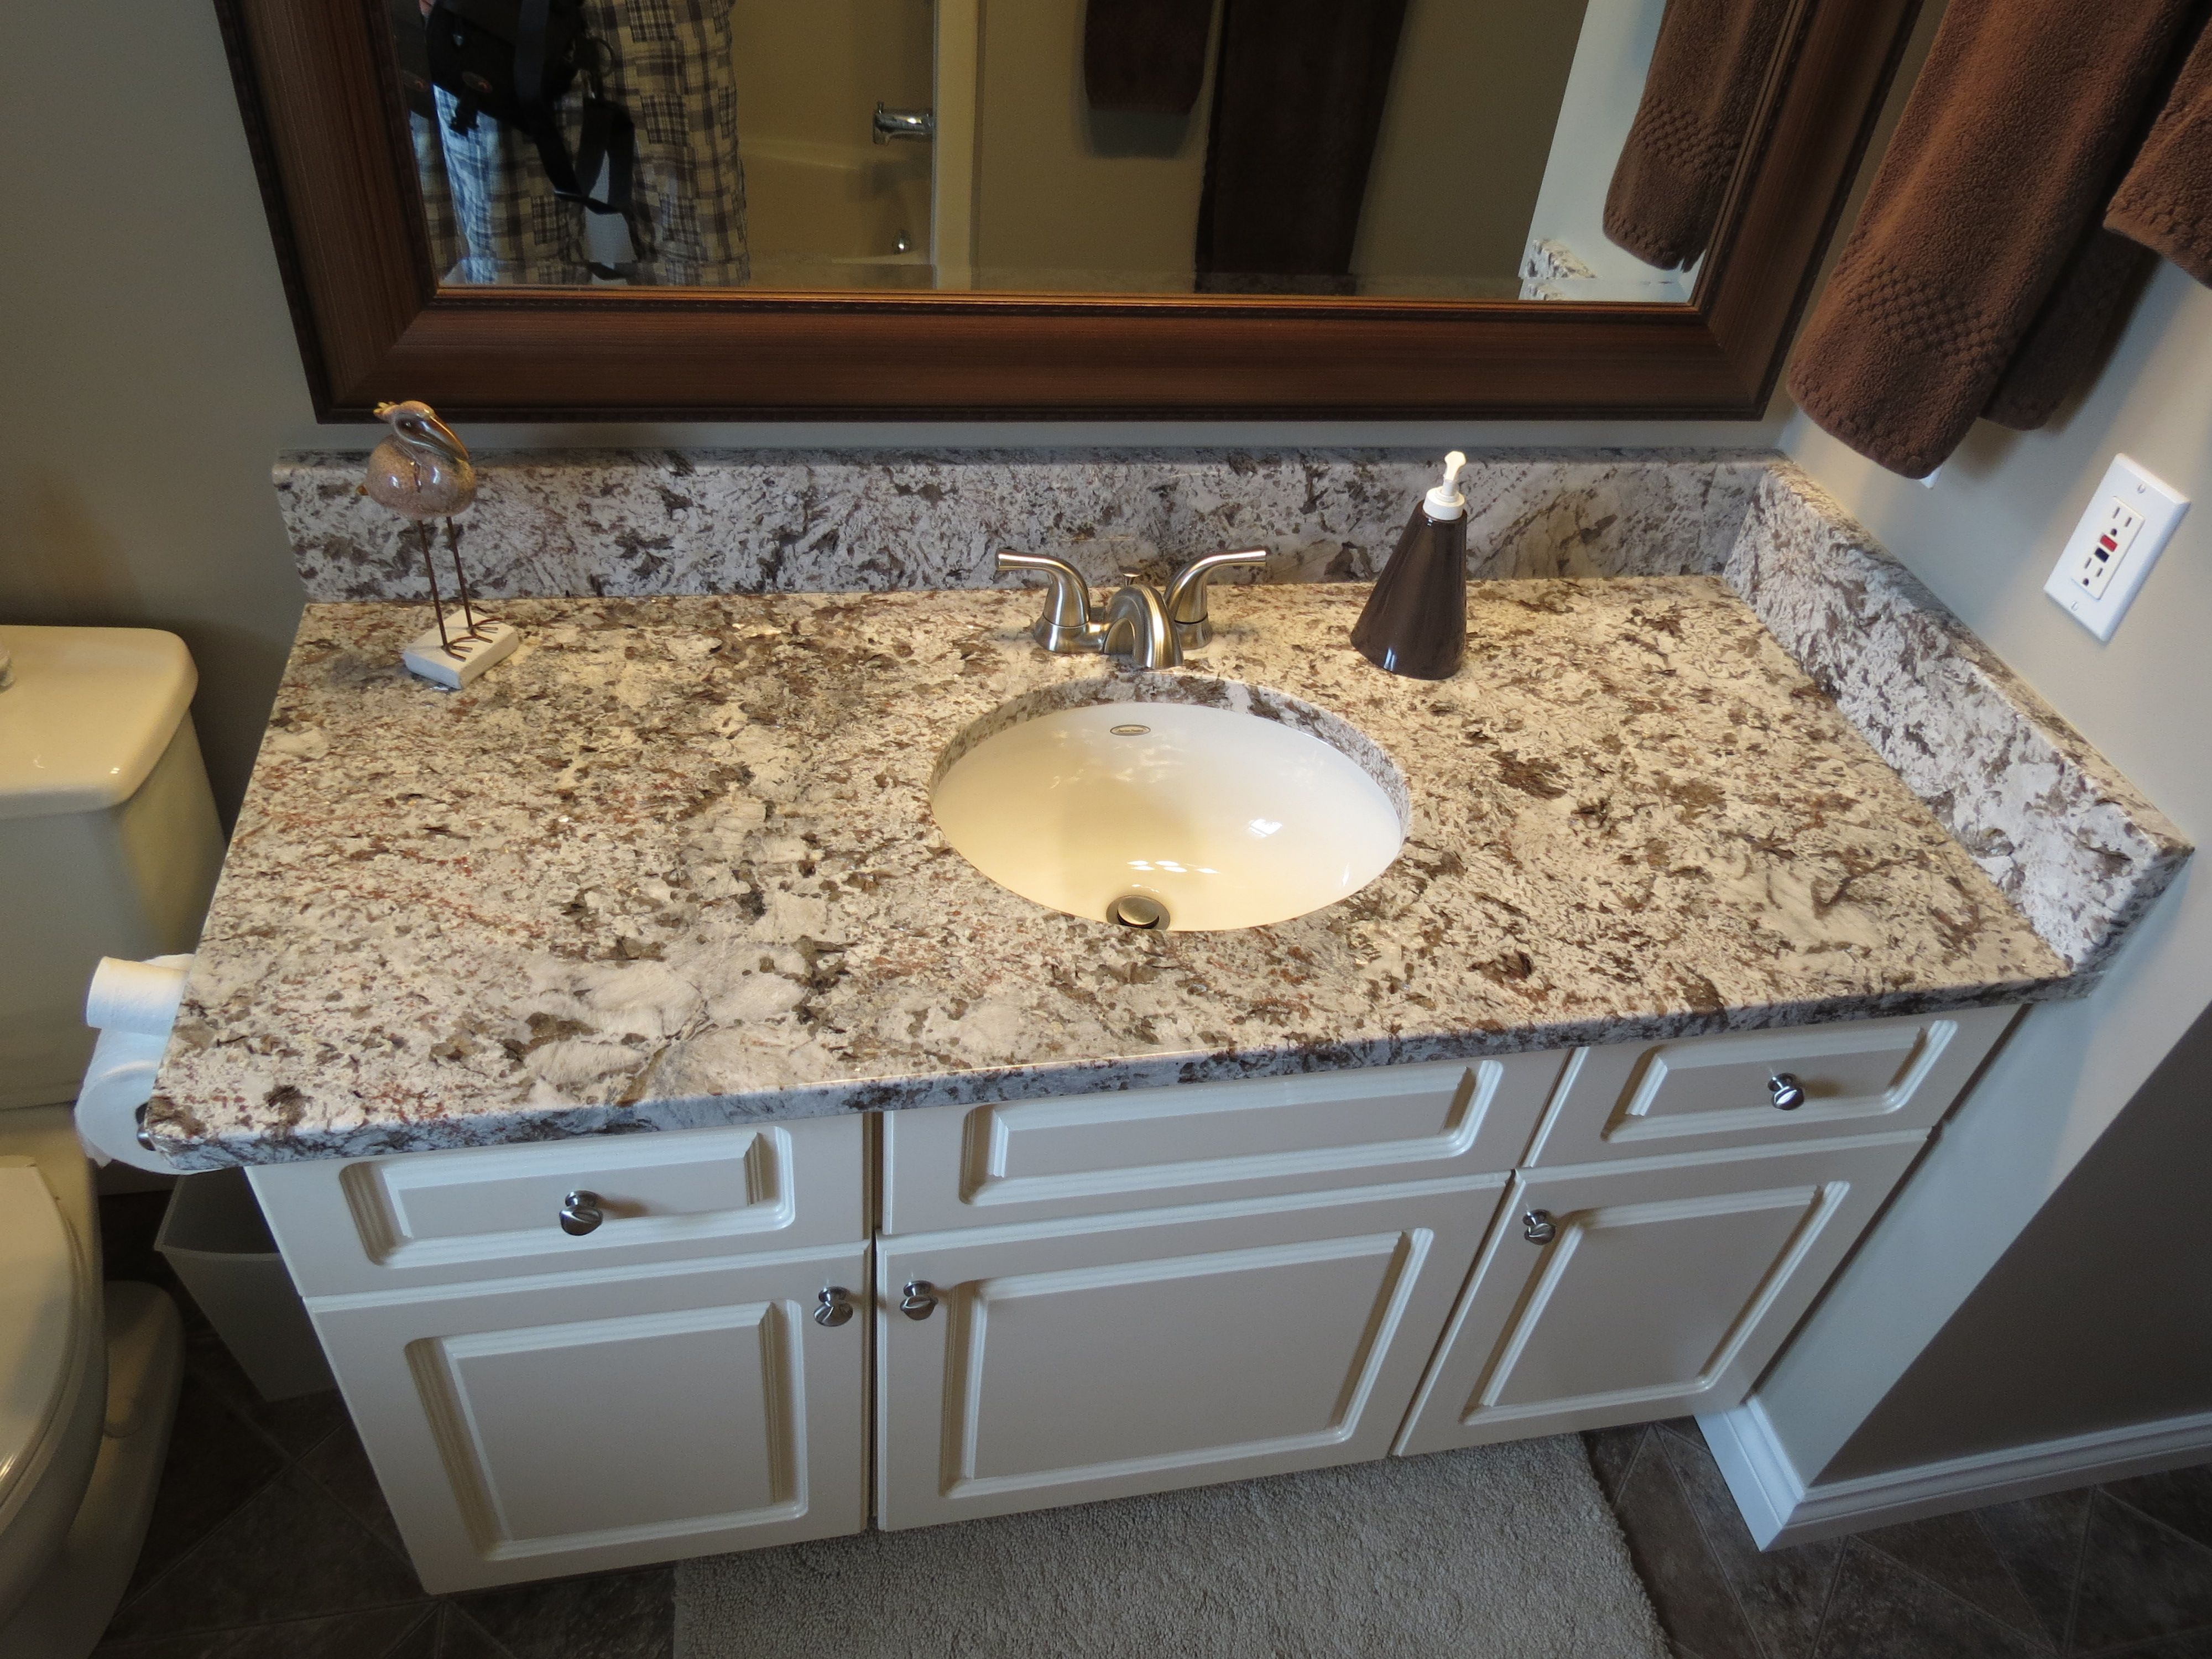 countertops okc kitchen cabinets okc Bianco Antico Granite Countertop Vanity Countertops Granite Countertops Oklahoma City